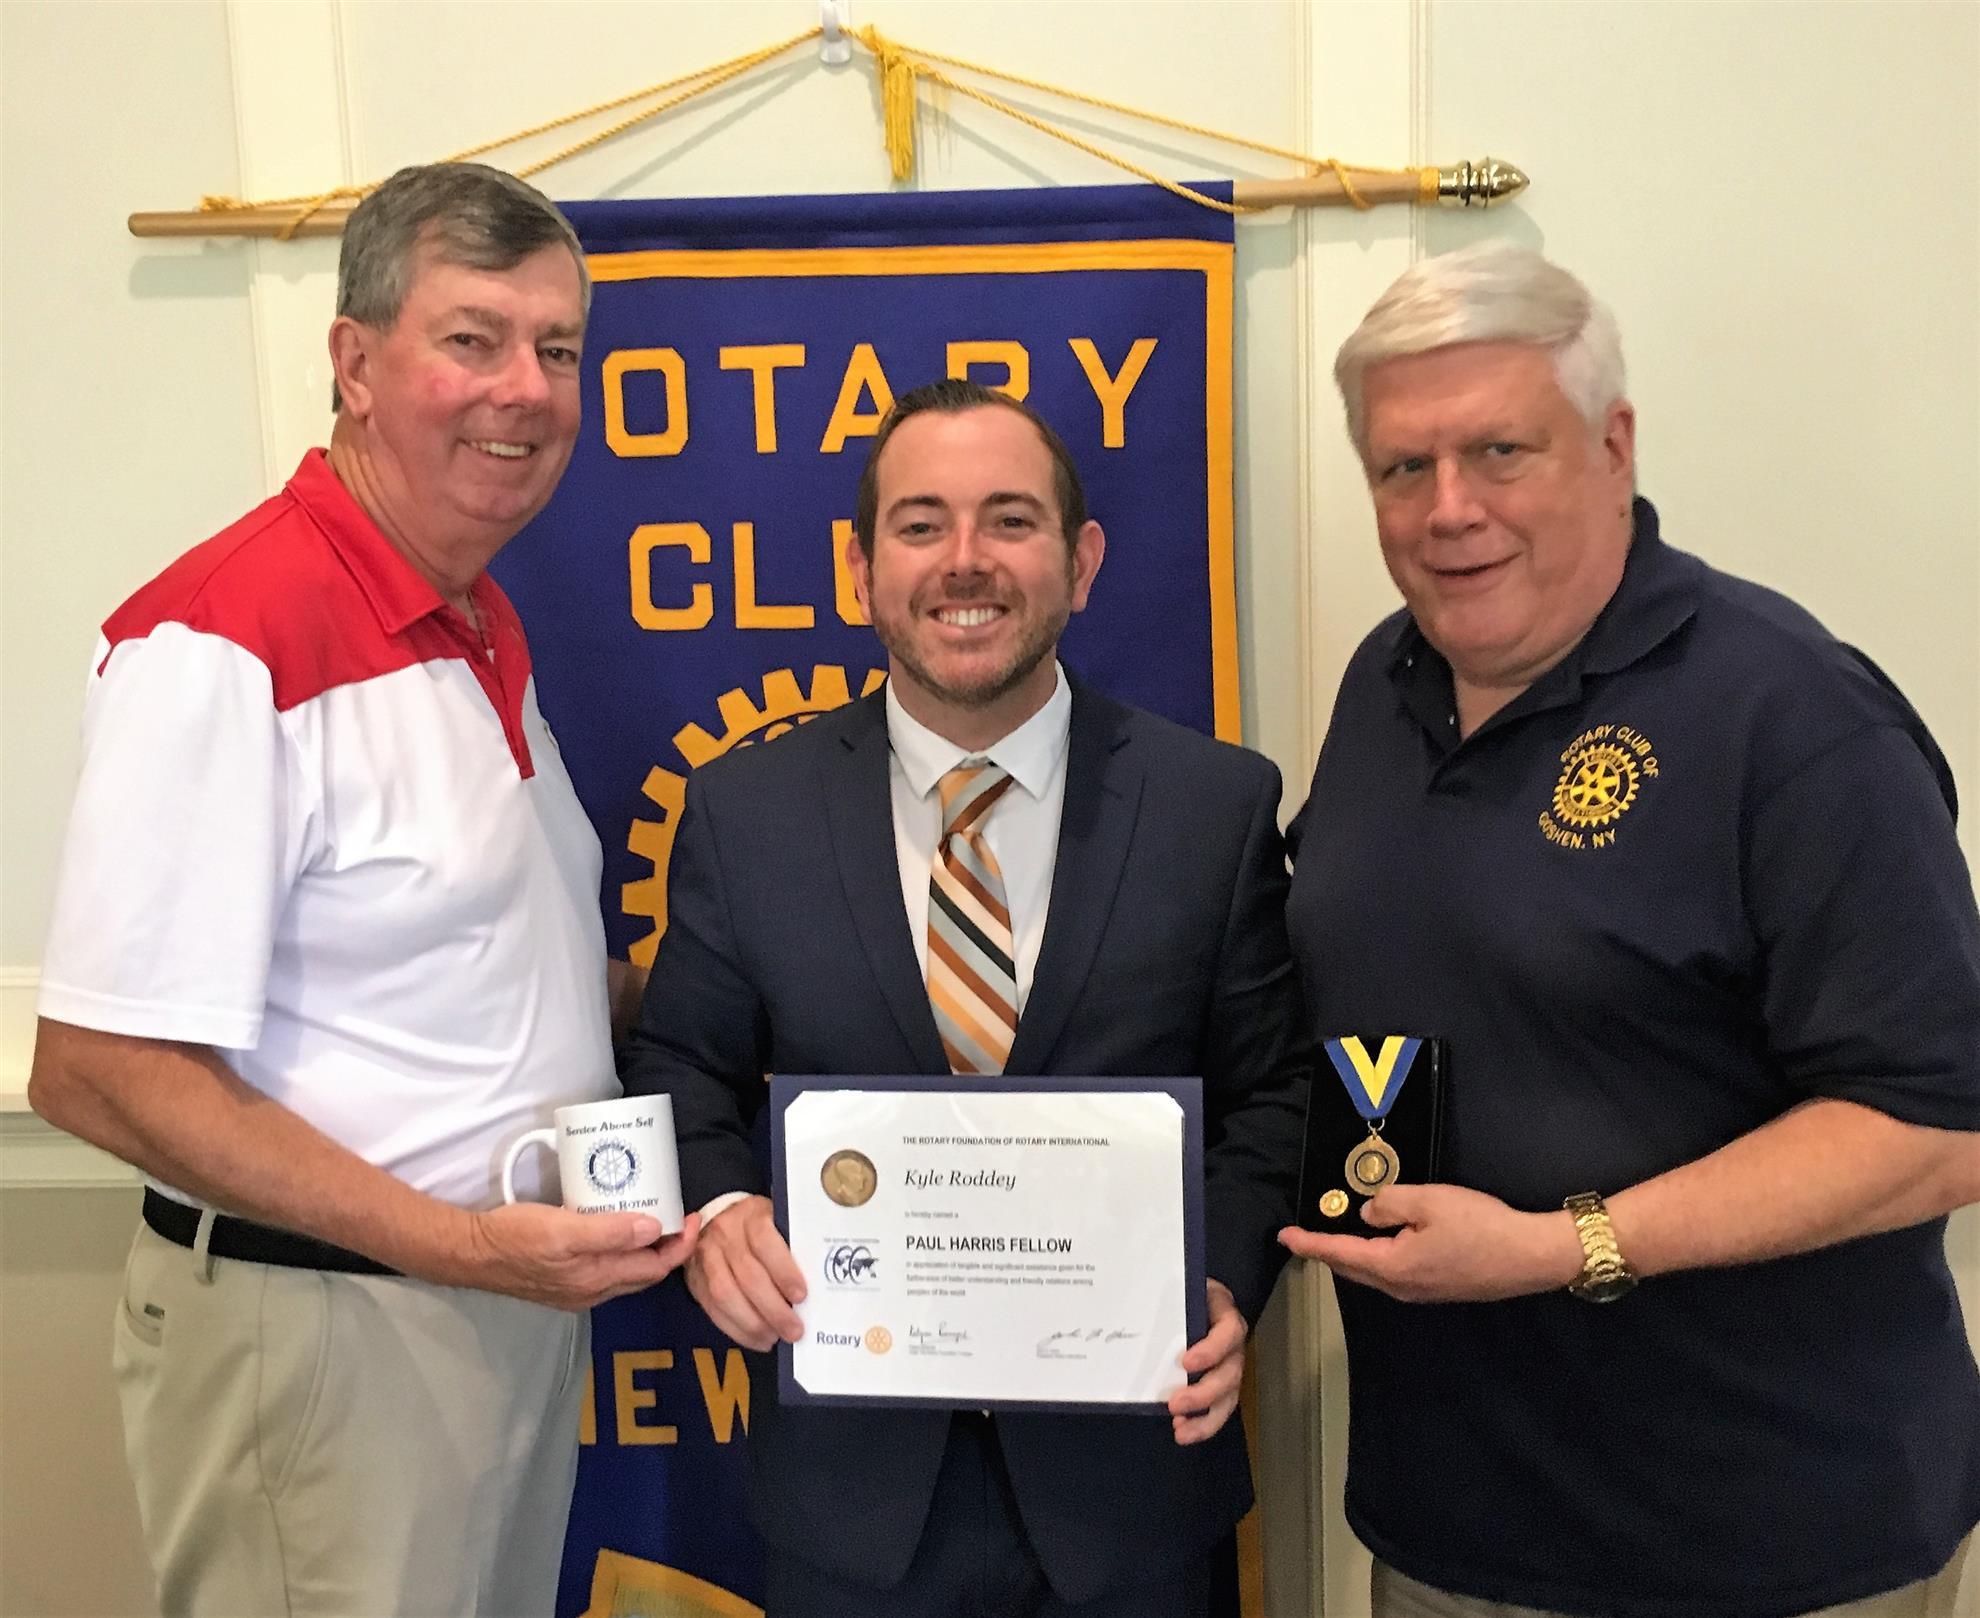 Kyle Roddey receiving a Paul Harris Fellowship Award